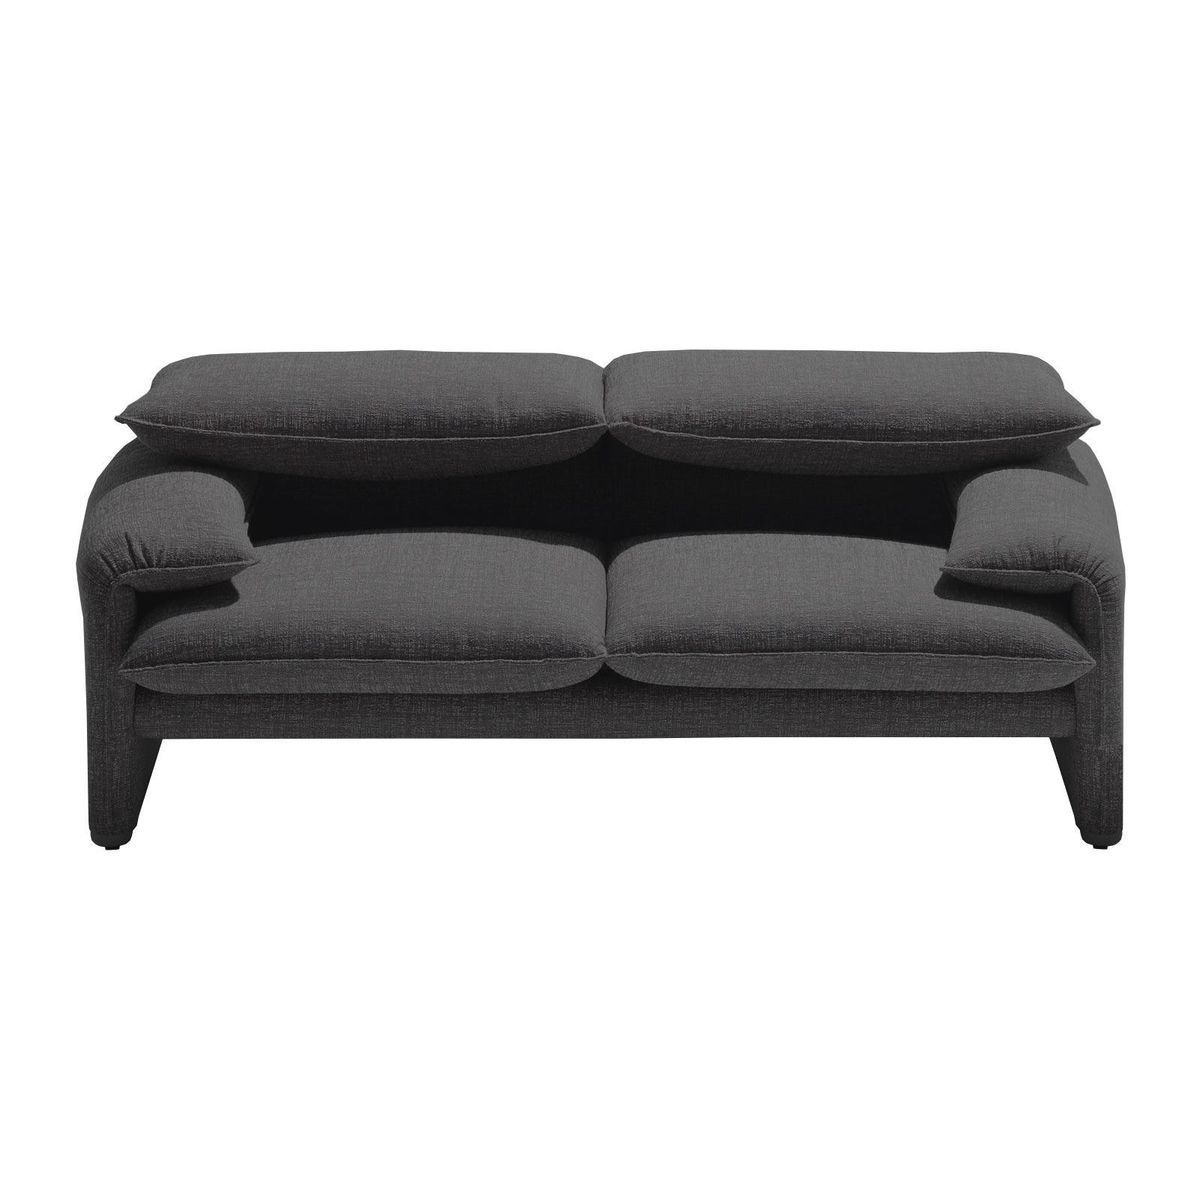 maralunga 40 canap 2 places 190x86cm cassina. Black Bedroom Furniture Sets. Home Design Ideas